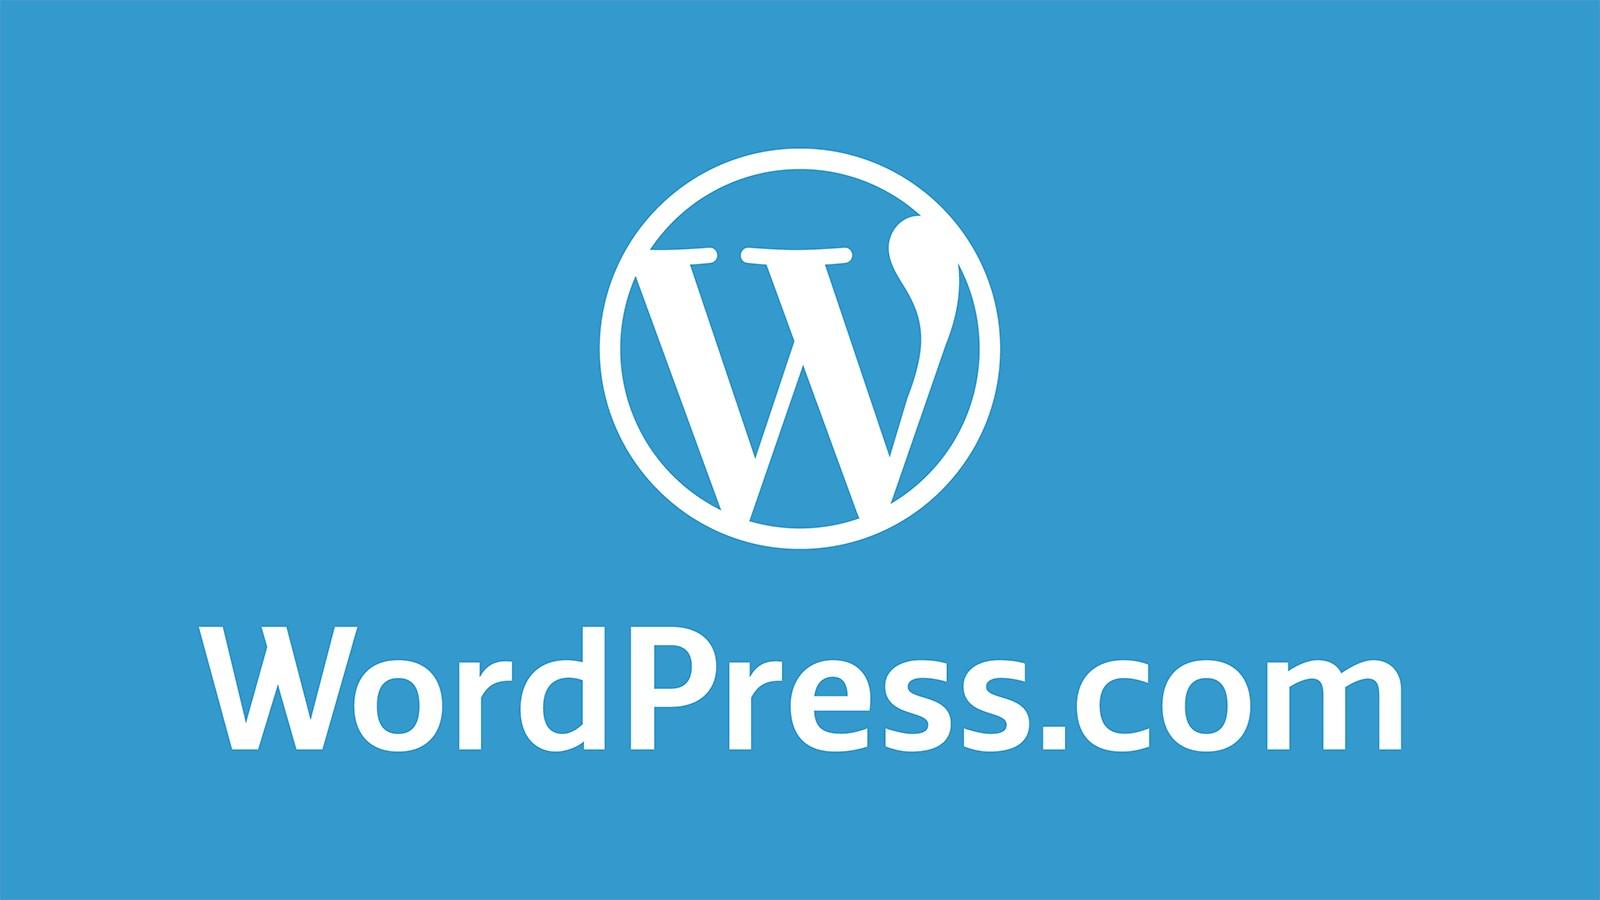 SmartBrains-WordPress-Website-DevelopmentLearning-Programming-Software-development-Web-Development-winter-Summer-Training-Noida-Chennai-Pune-Mumbai-Dehradun